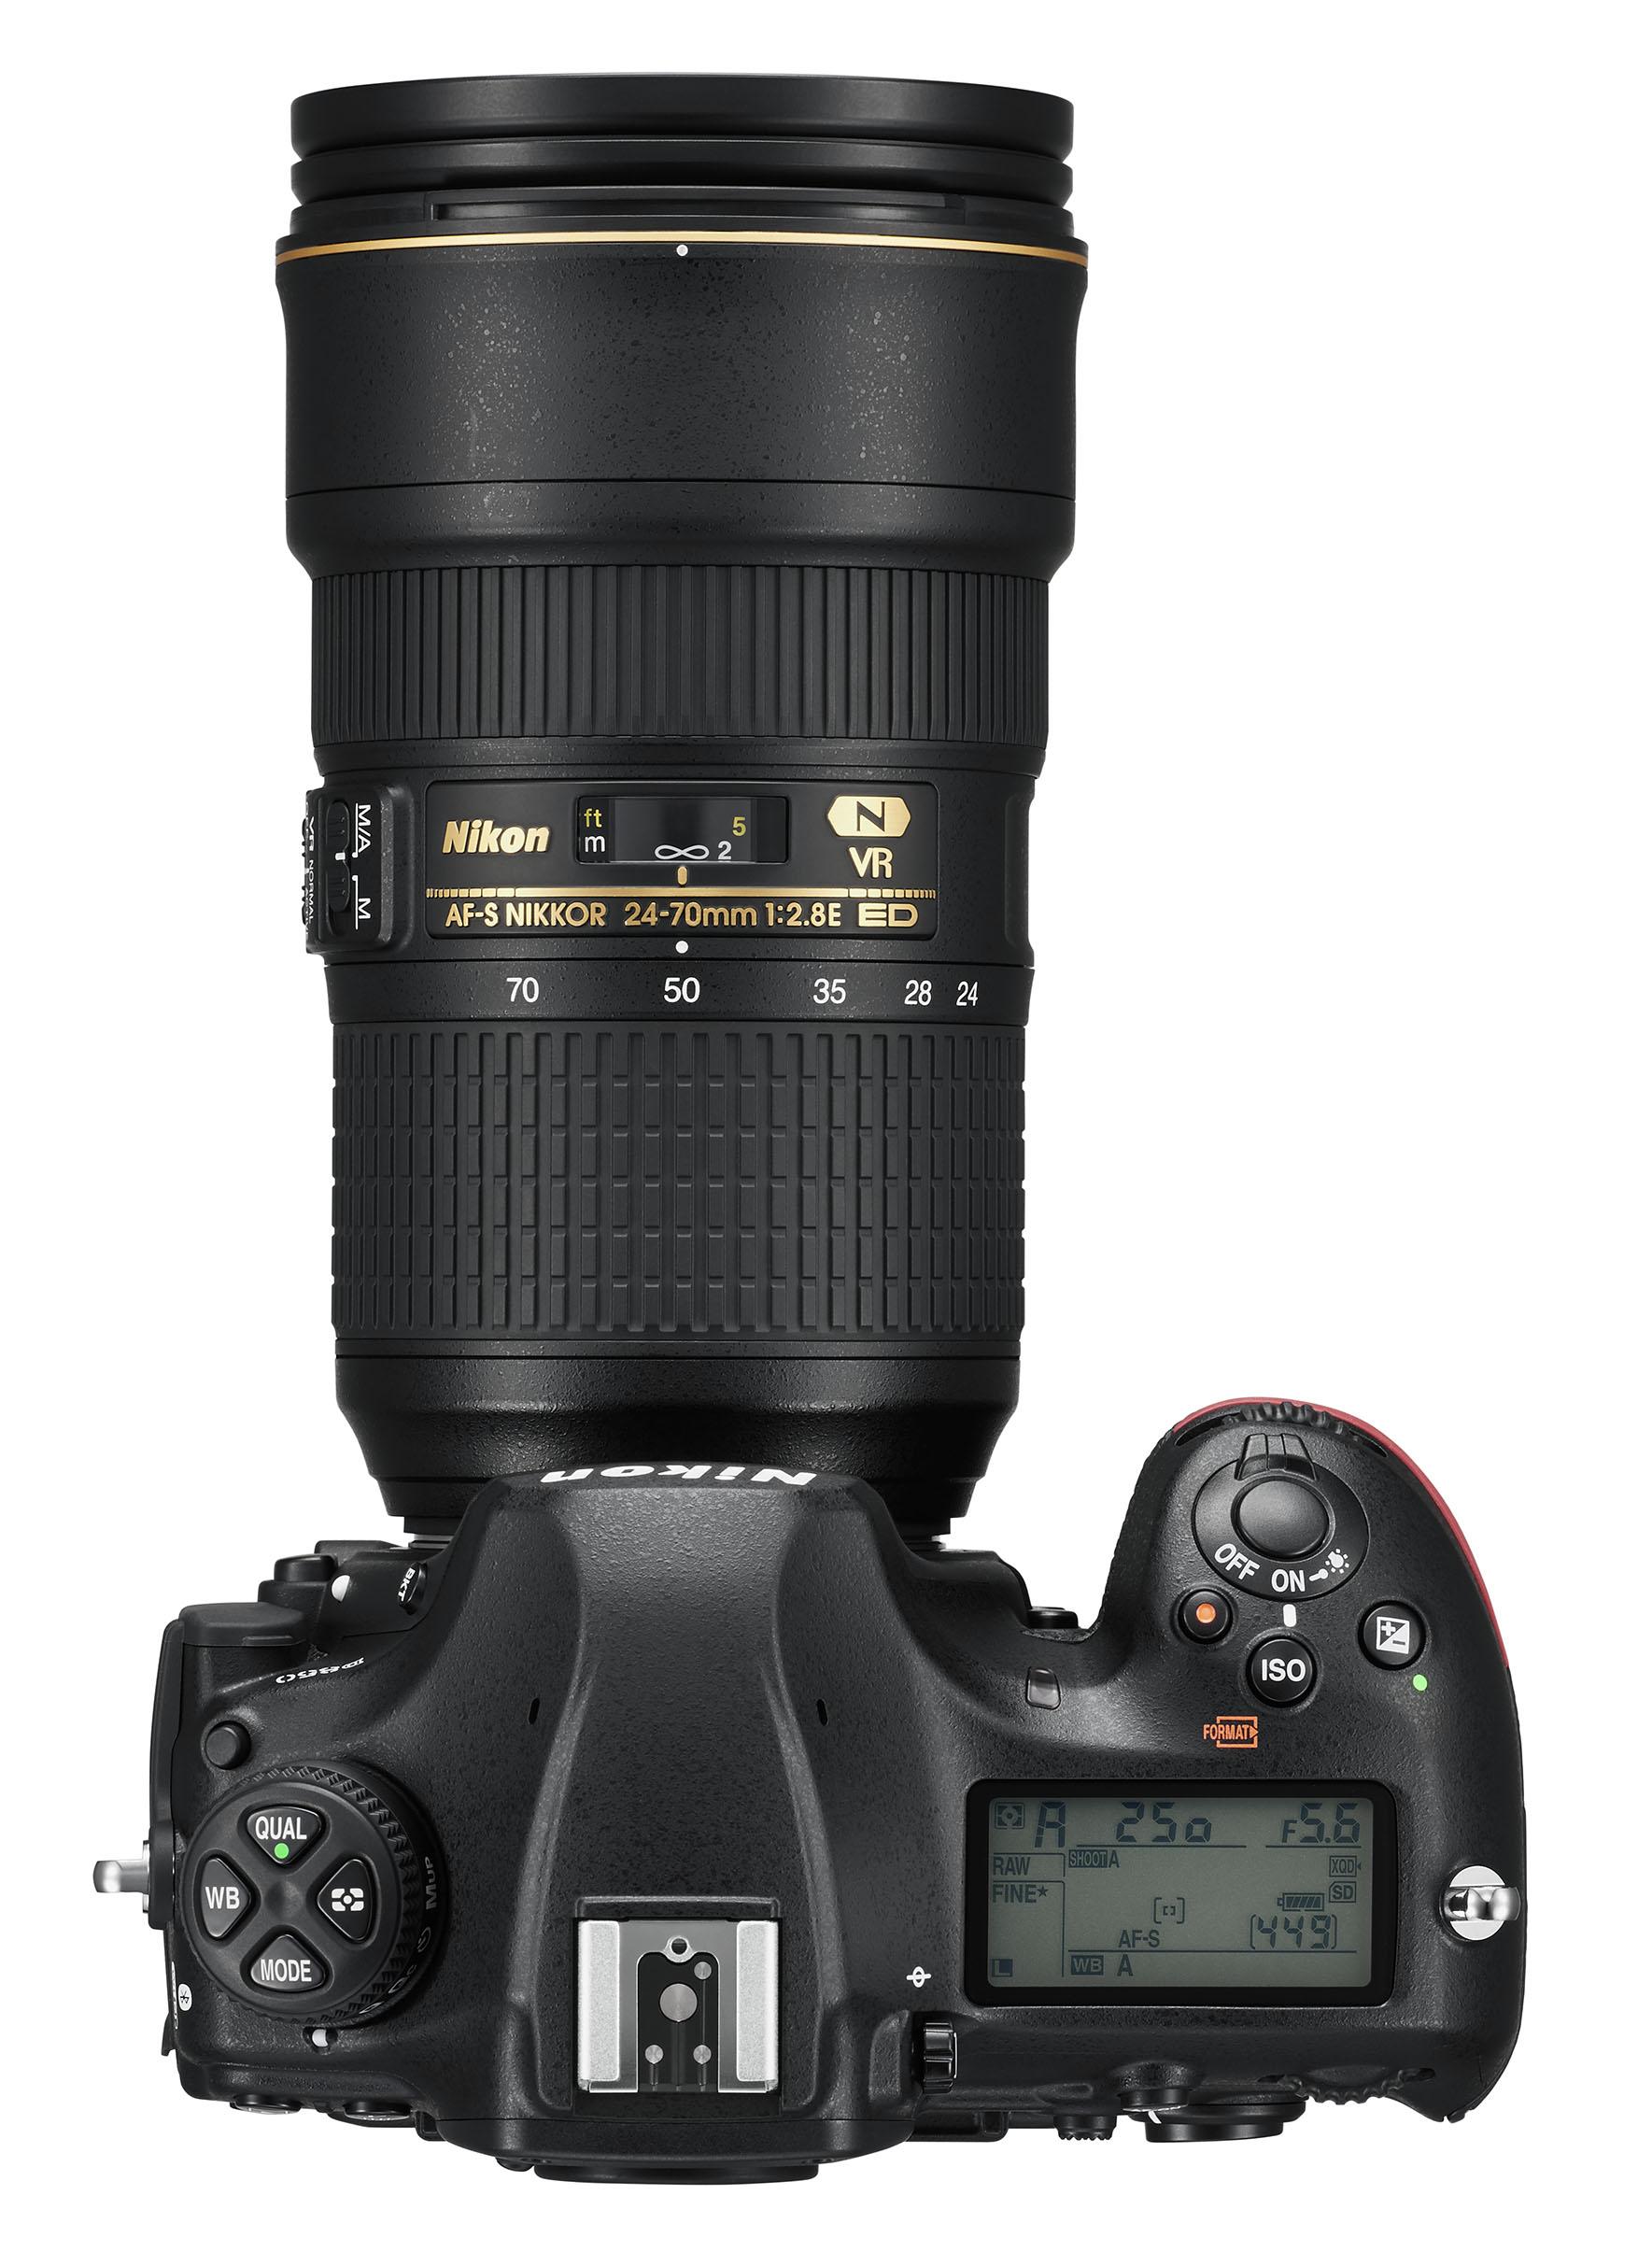 Nikon's new D850 has 45 7 megapixels and enough features to tempt